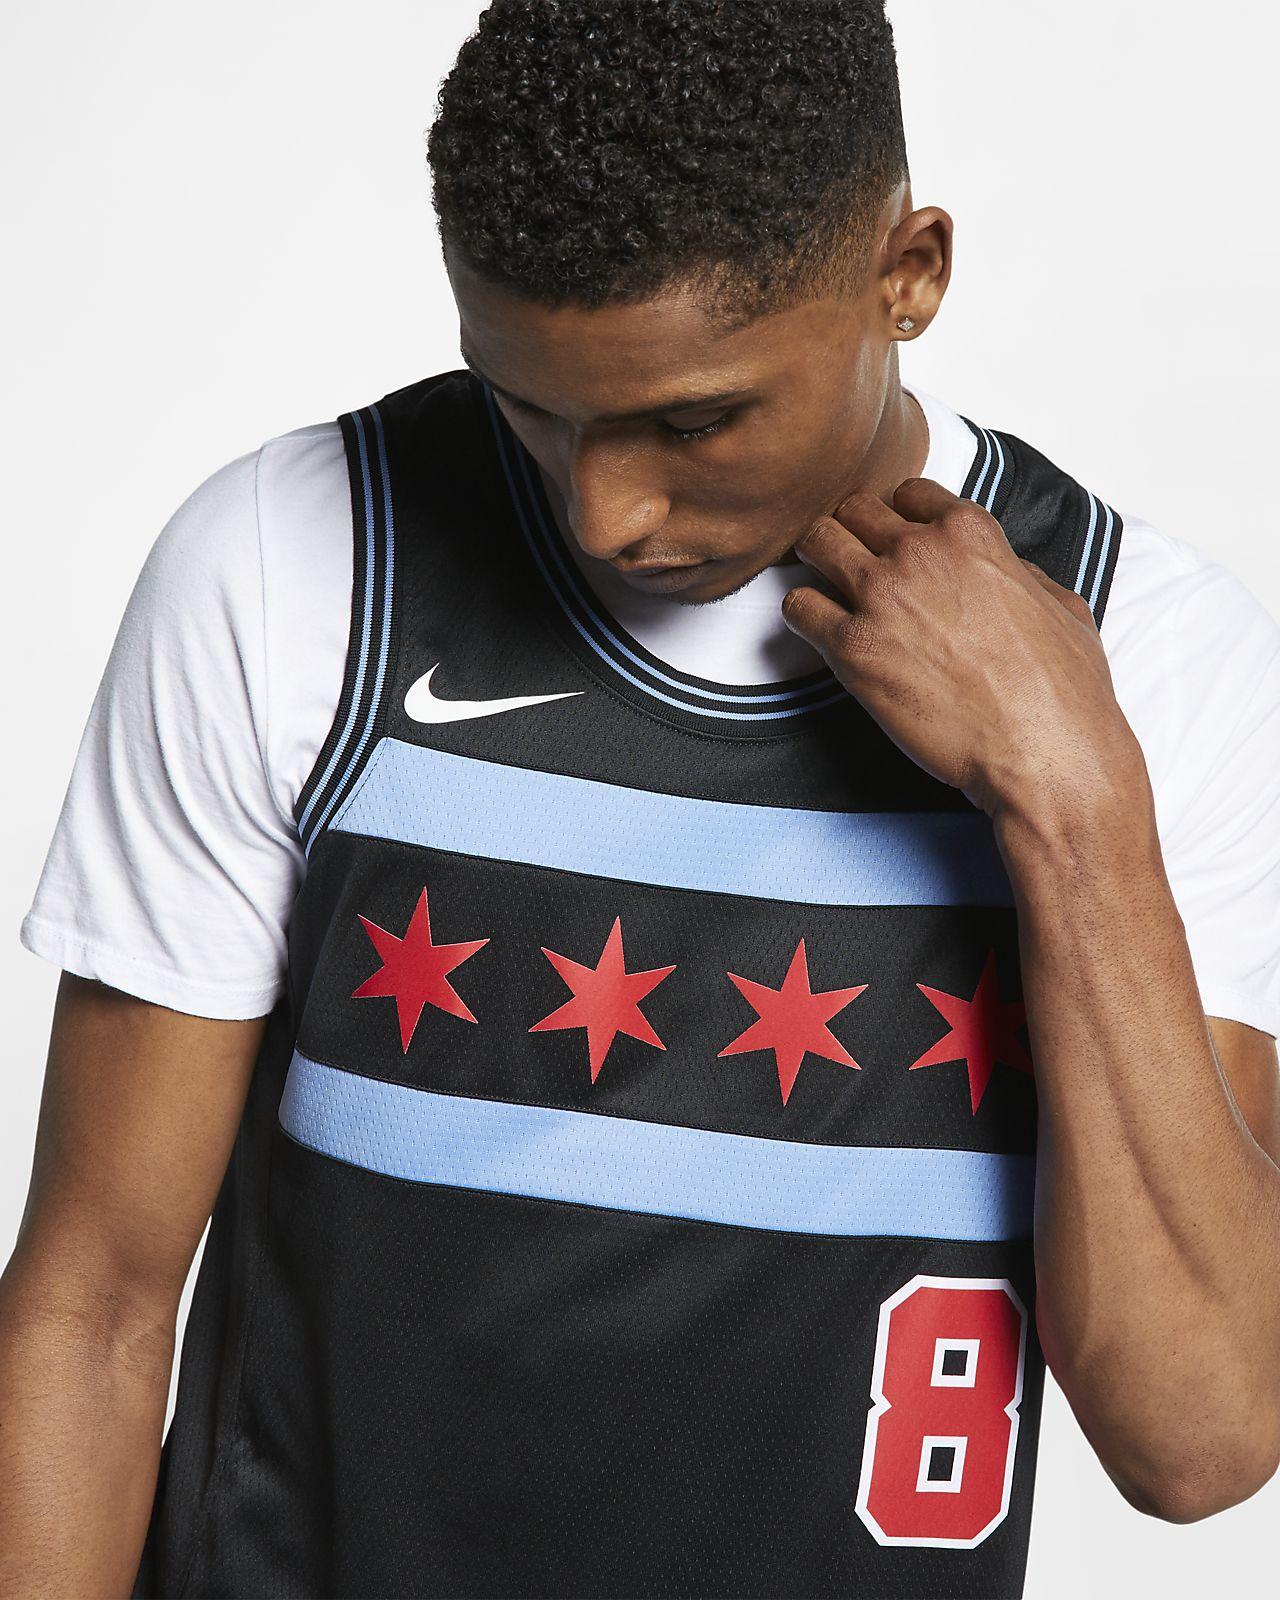 6da3d40b350 ... Zach LaVine City Edition Swingman (Chicago Bulls) Men s Nike NBA  Connected Jersey